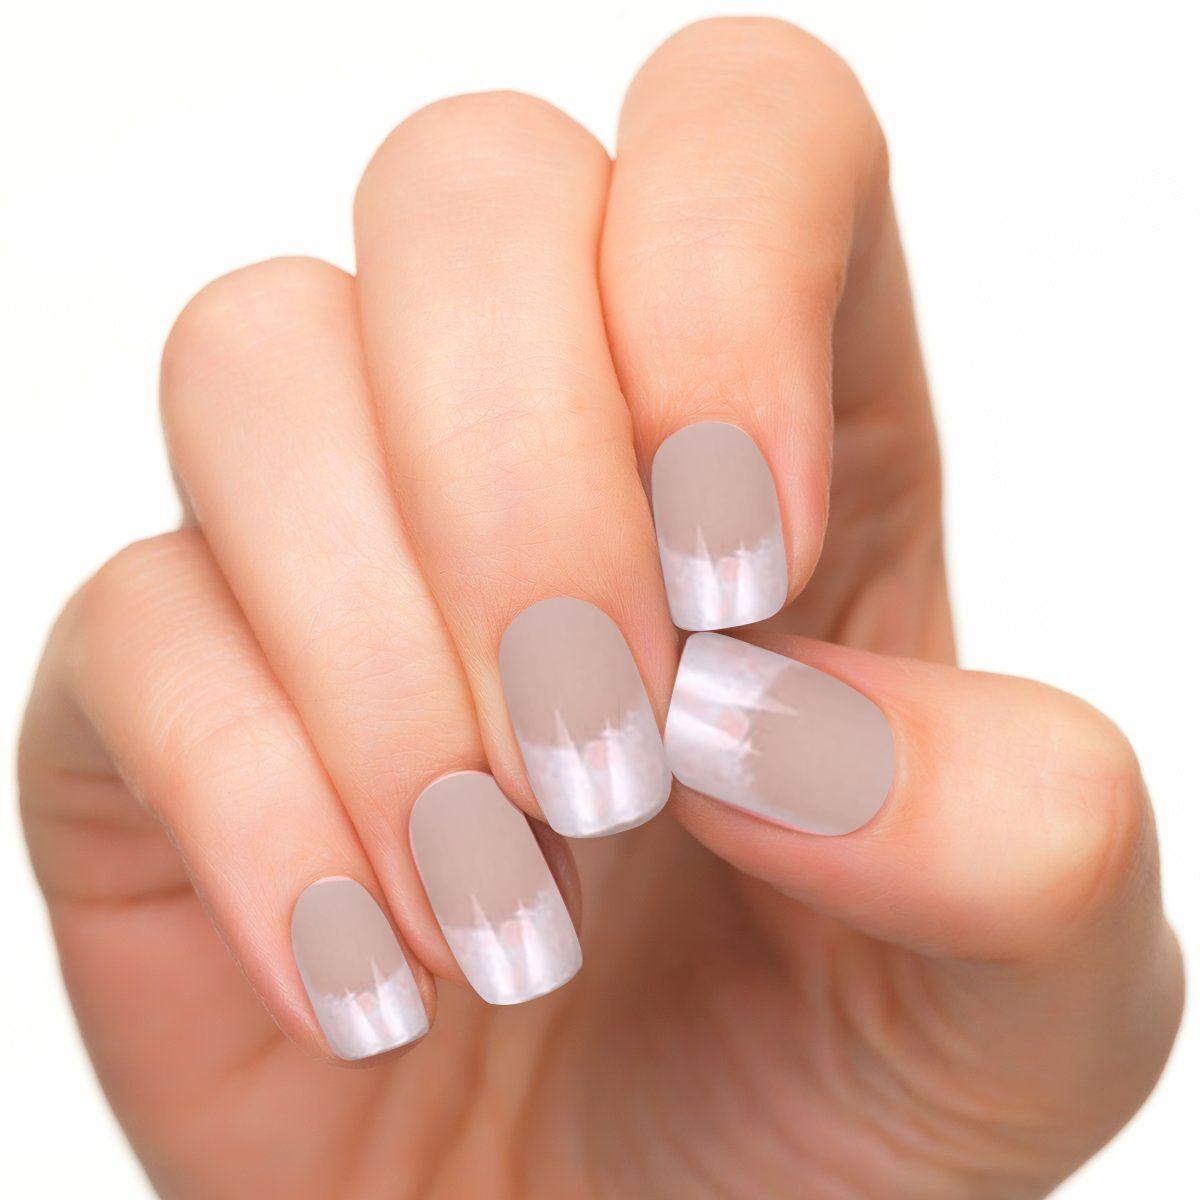 Set 24pcs French Acrylic False Nail Art Tips Full Nails Manicure Pre ...